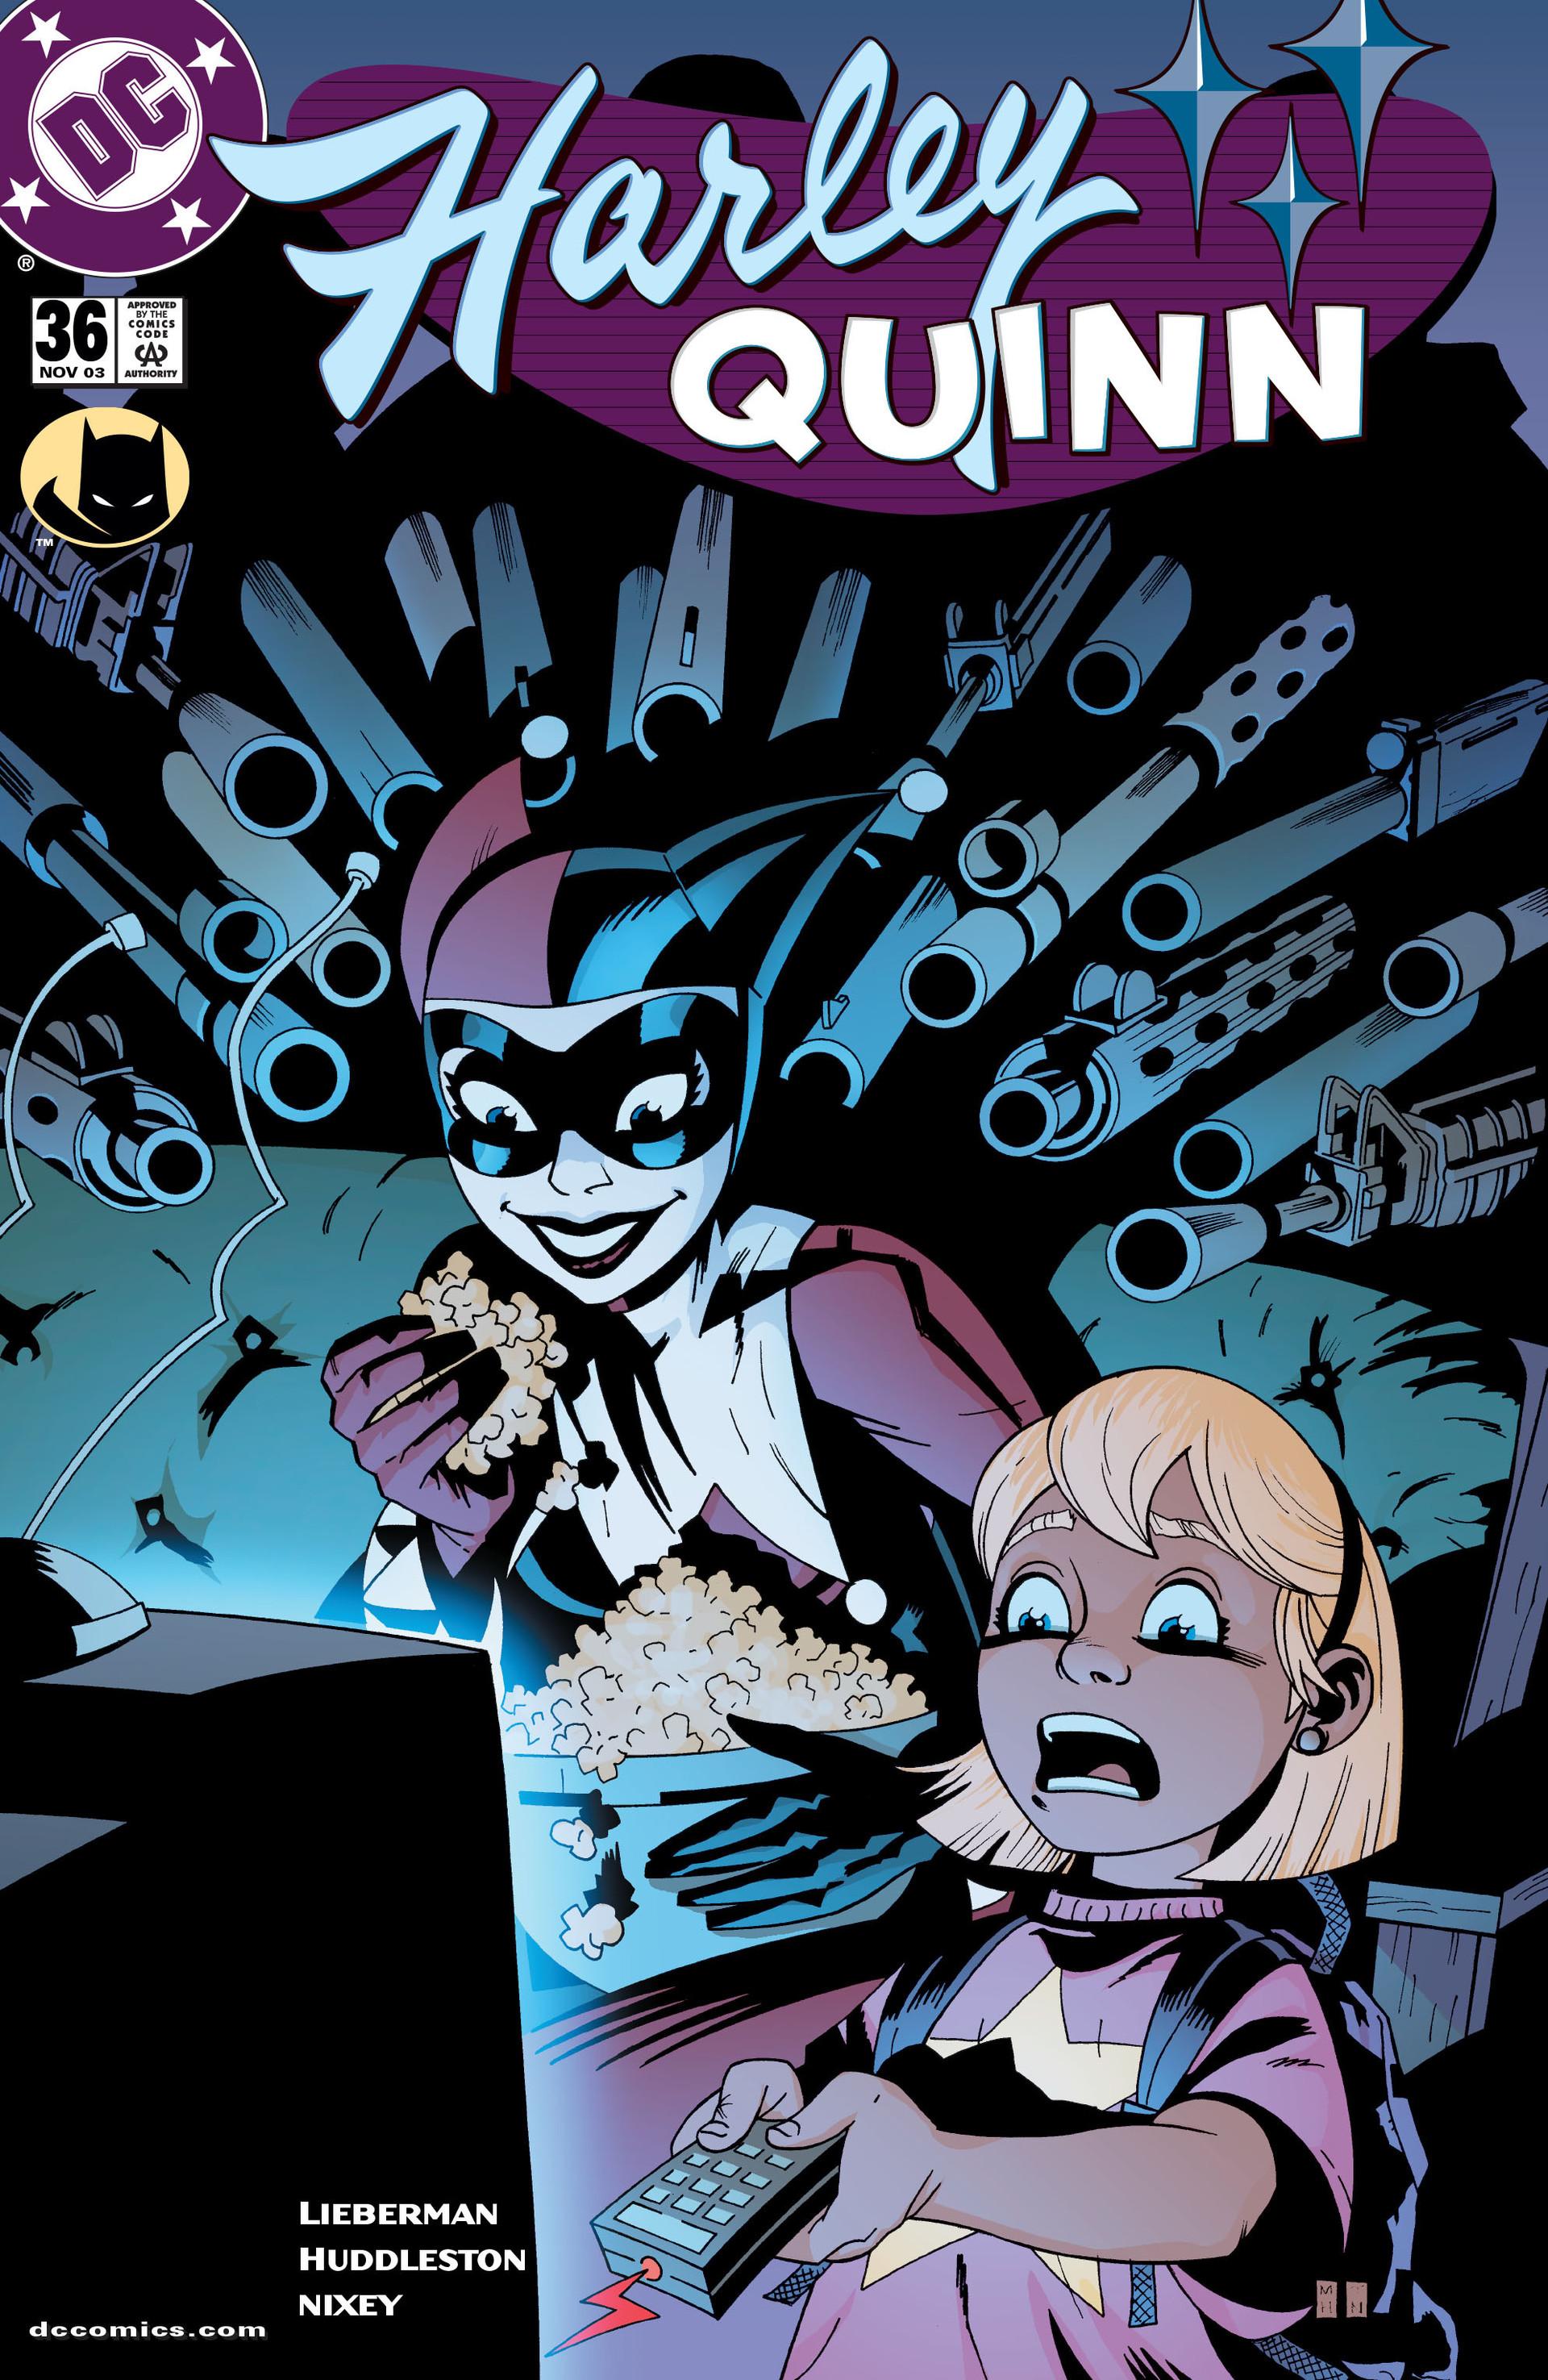 Harley Quinn Vol.1 #36